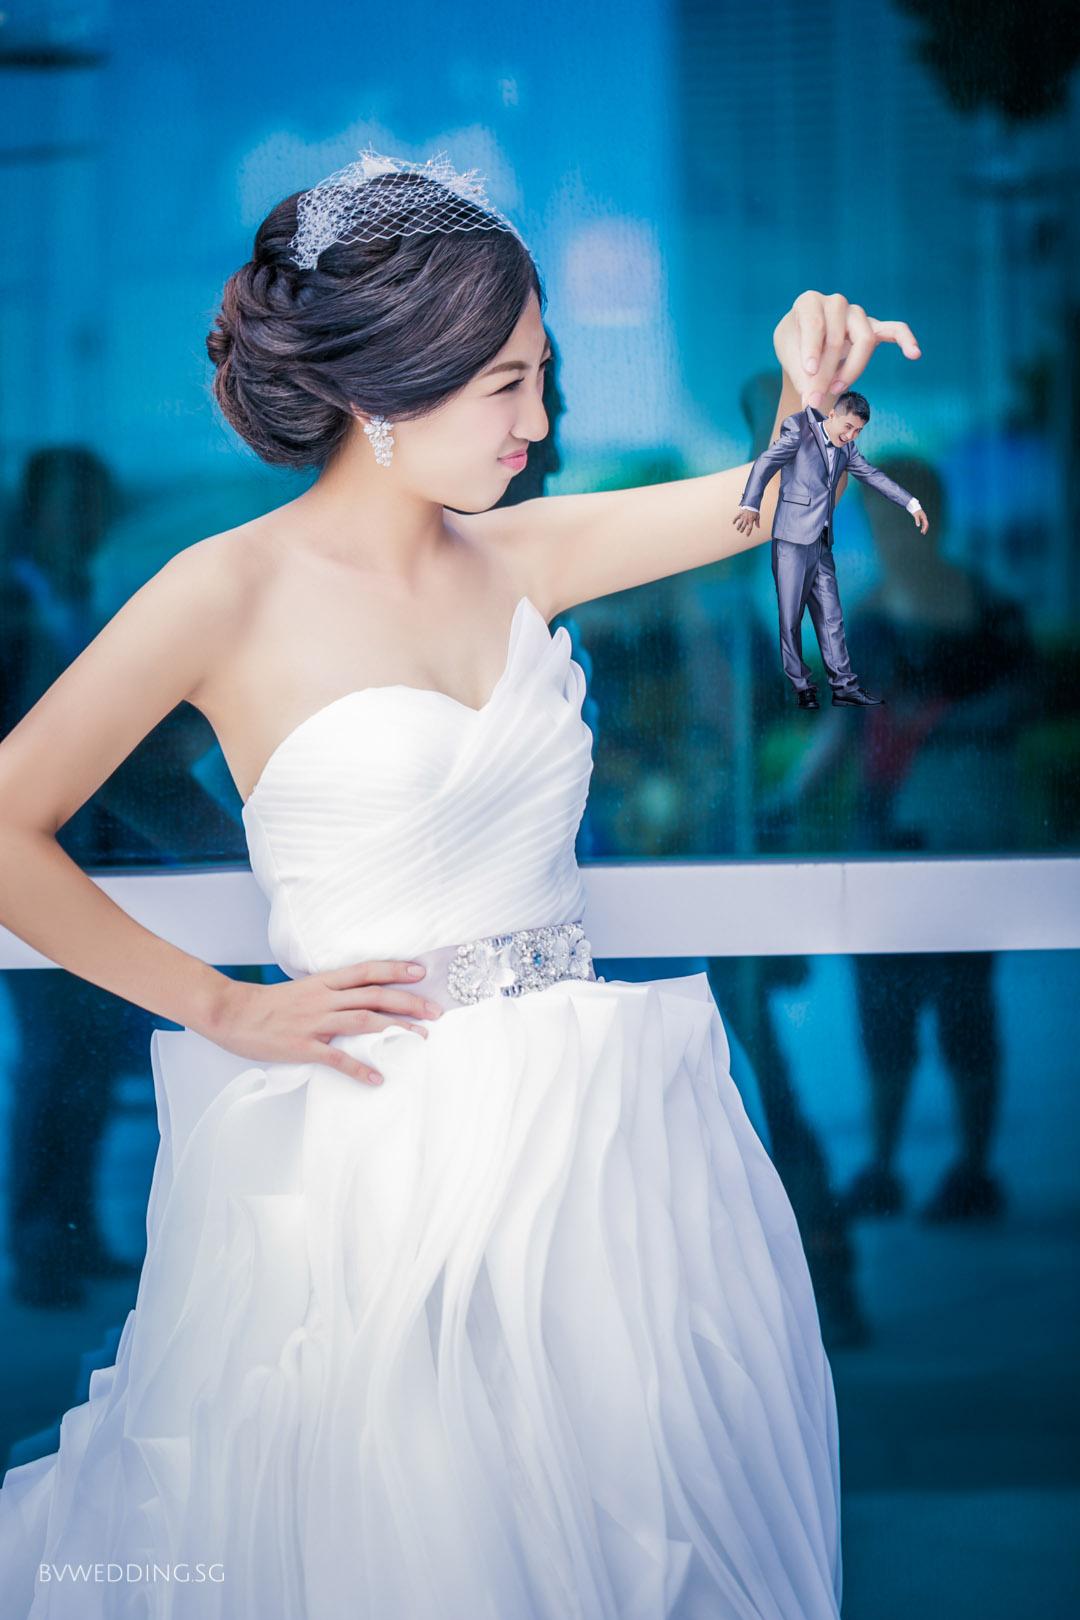 Creative Pre-wedding Photoshoot